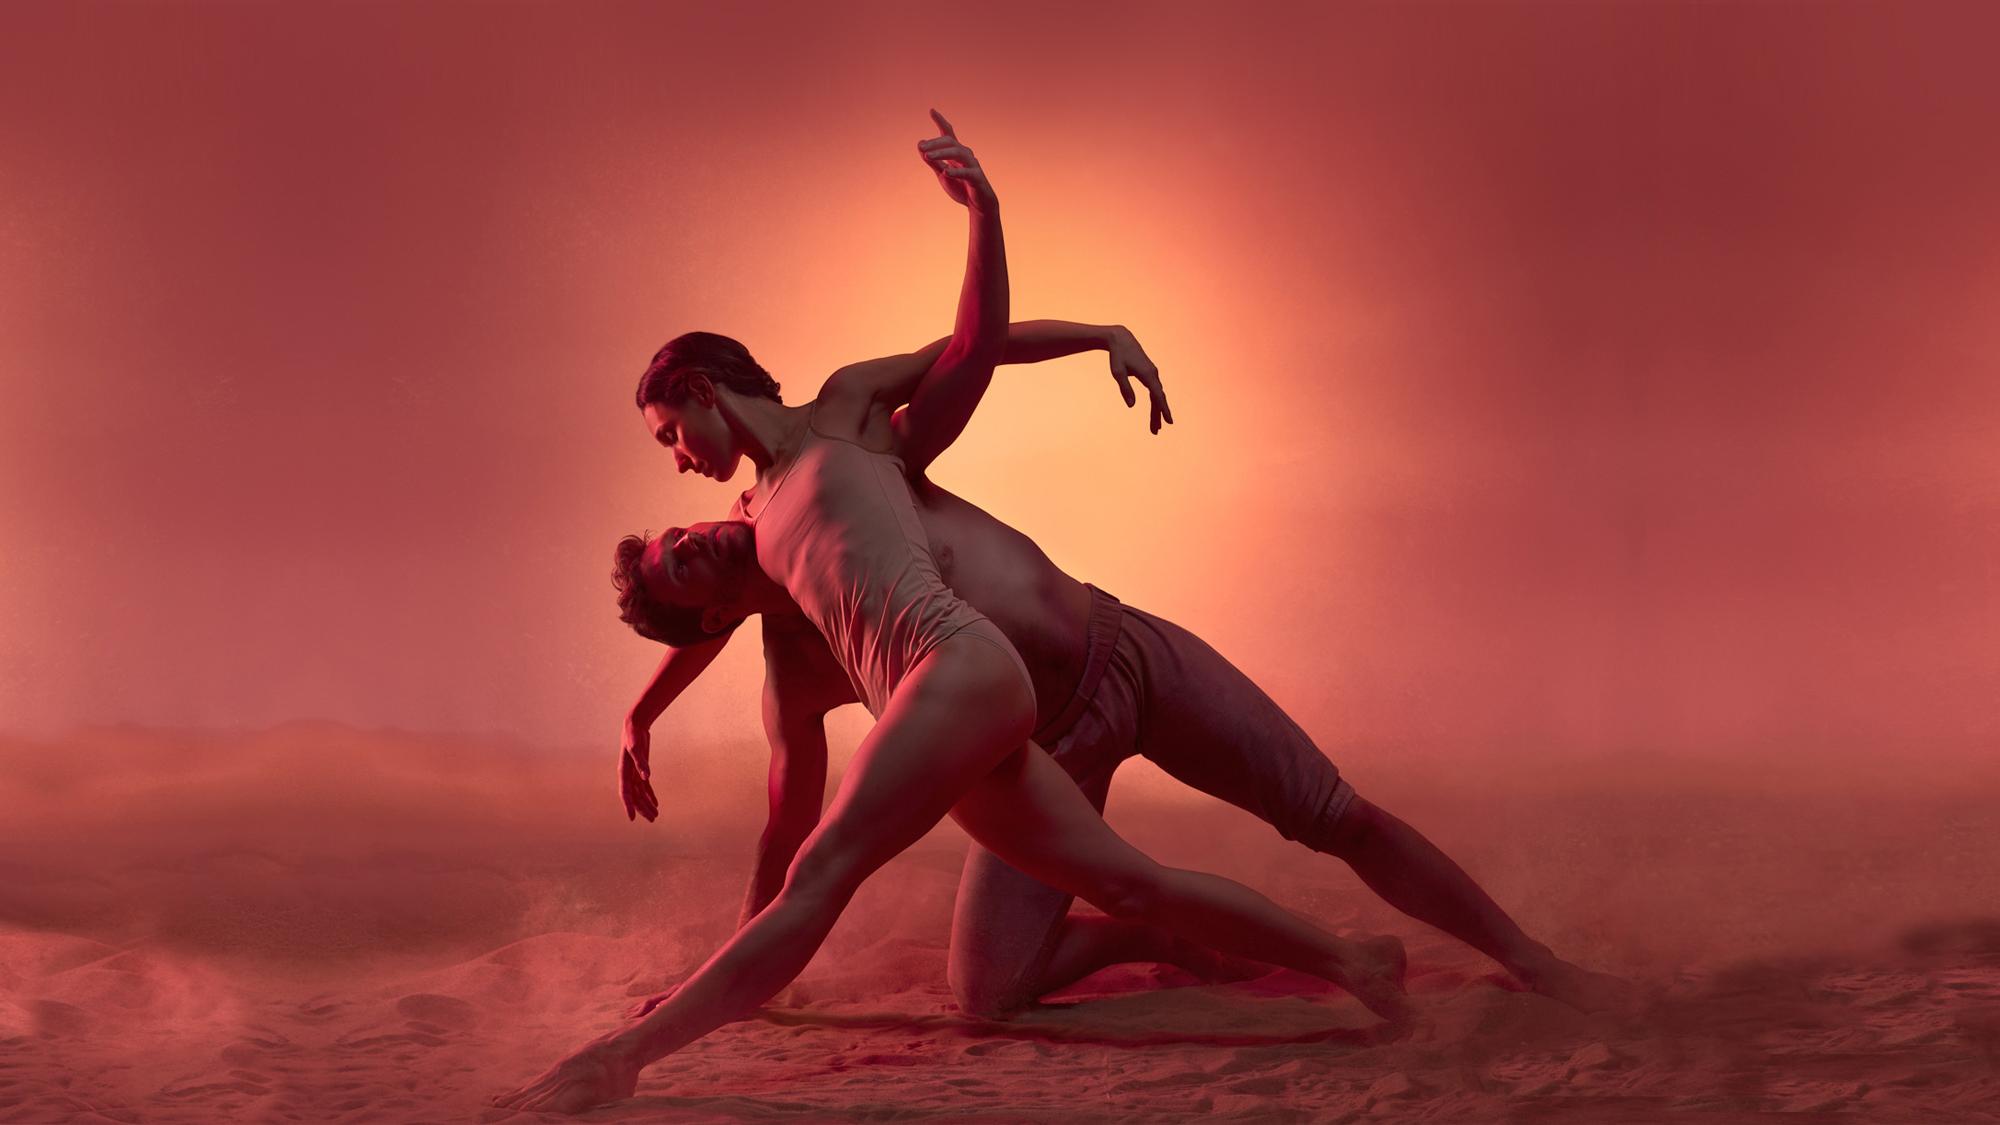 Andrew Skeels Choreography - Danse Danse